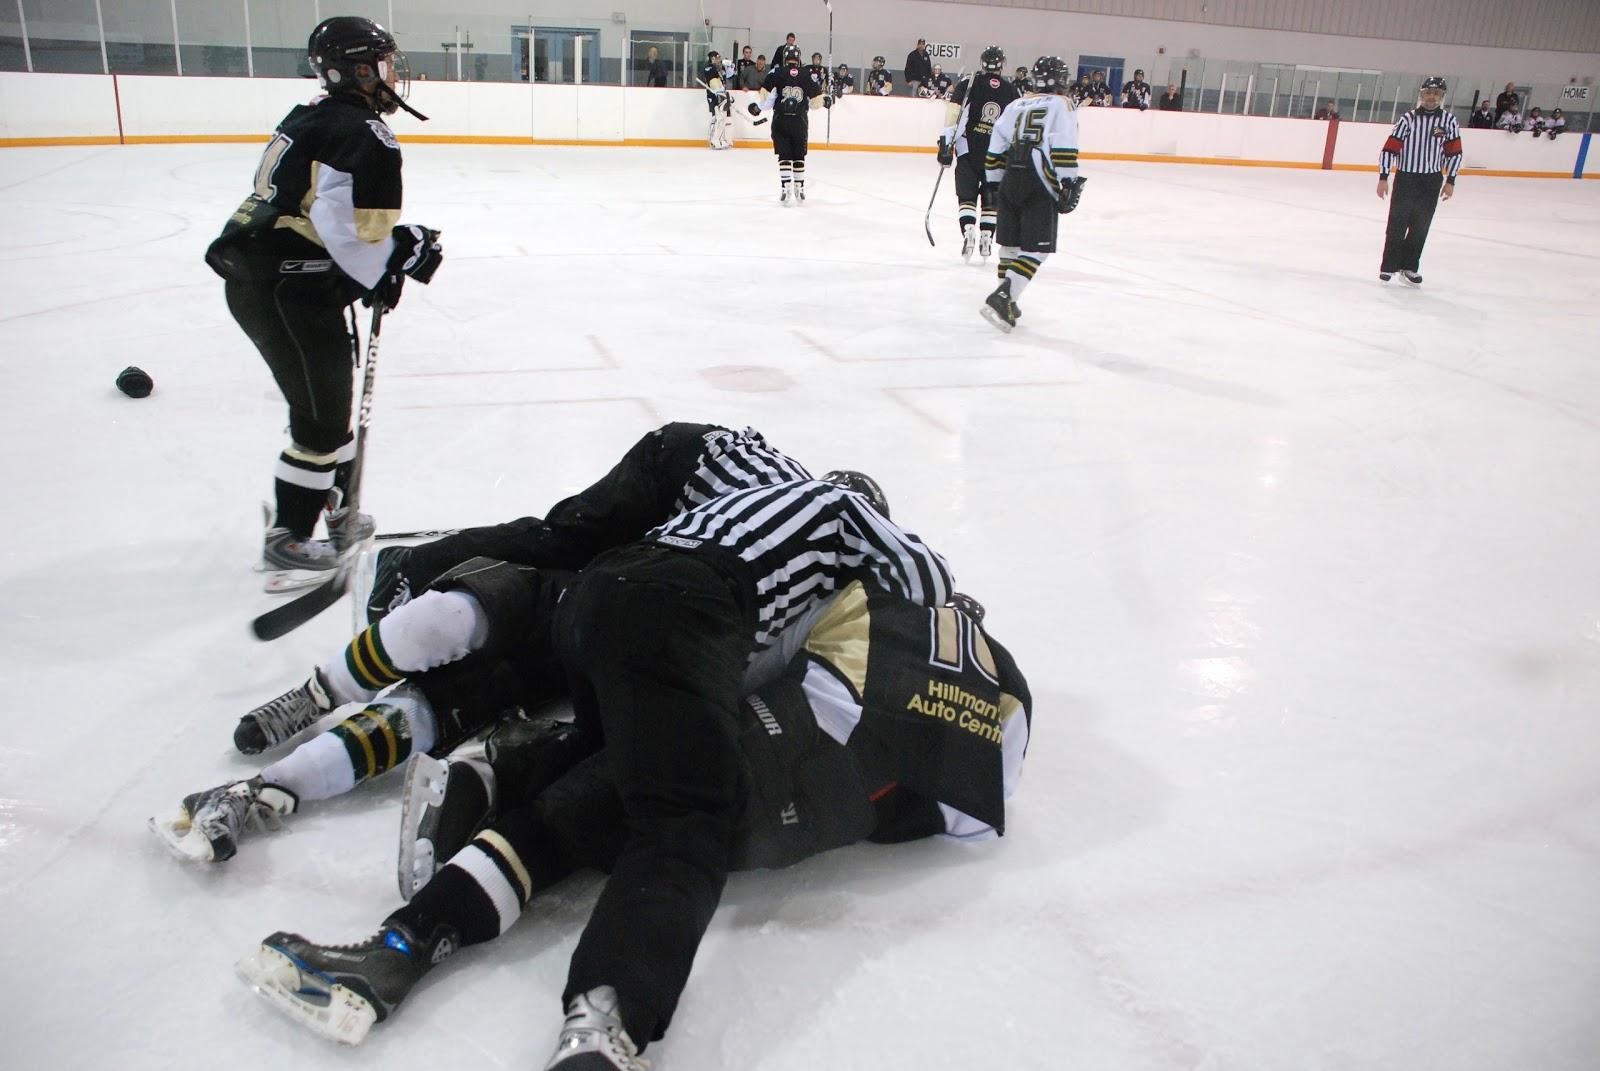 Midget hockey fight images 317